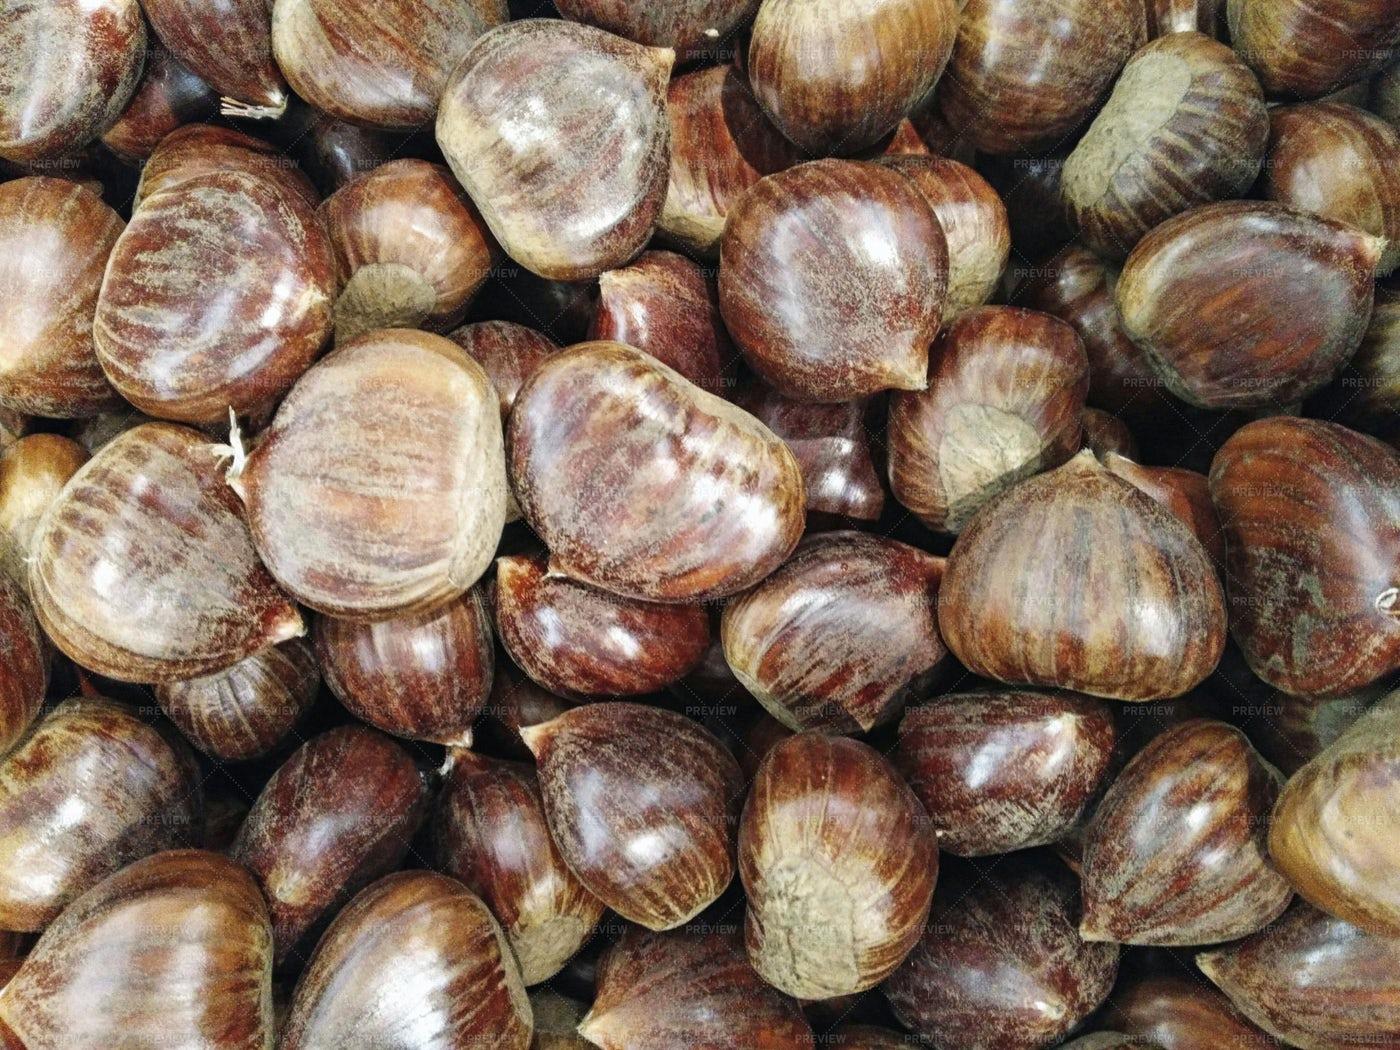 Chestnuts: Stock Photos